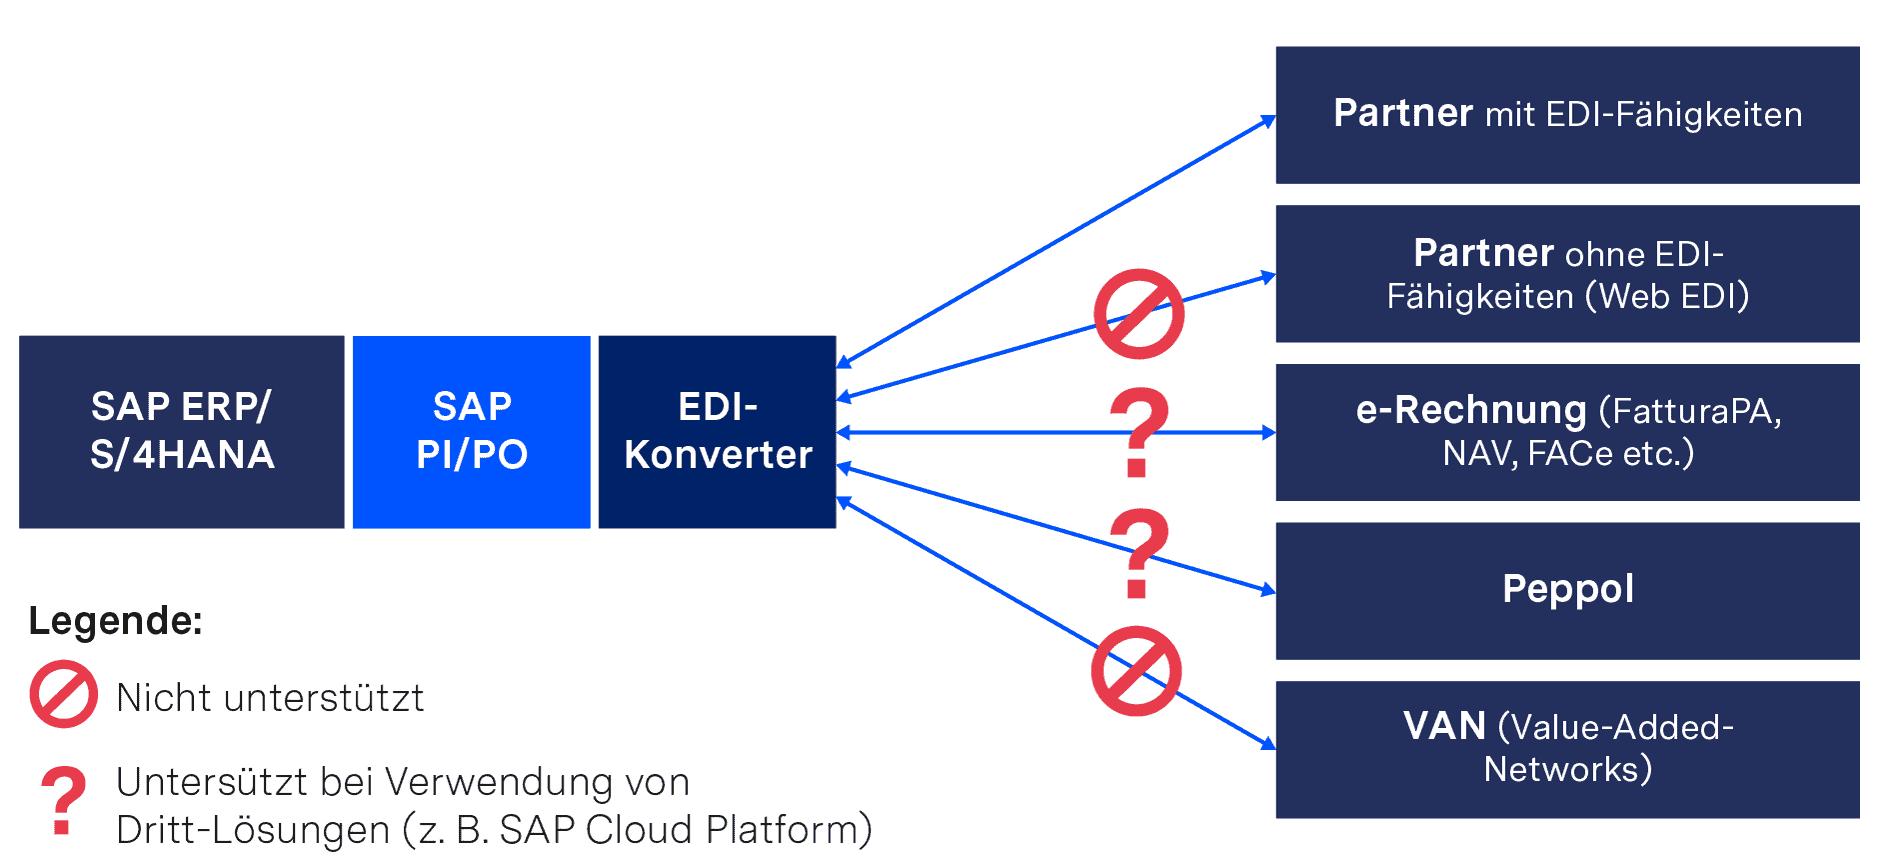 SAP PI/PO mit vorgelagertem lokalen EDI-Konverter